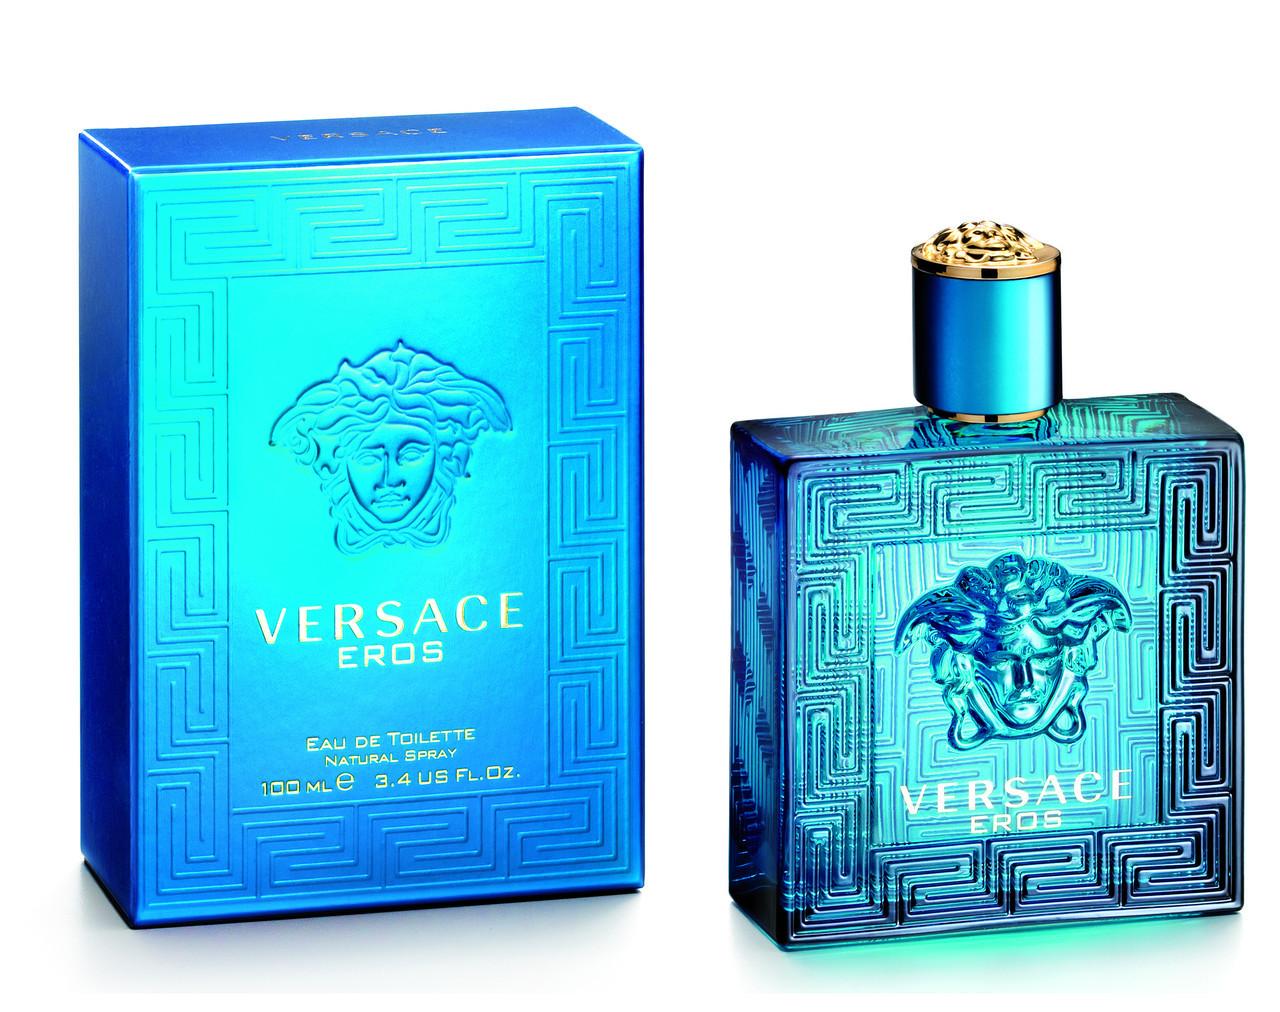 Туалетна вода чоловіча Versace Eros, 100 мл ПОМ'ЯТА УПАКОВКА